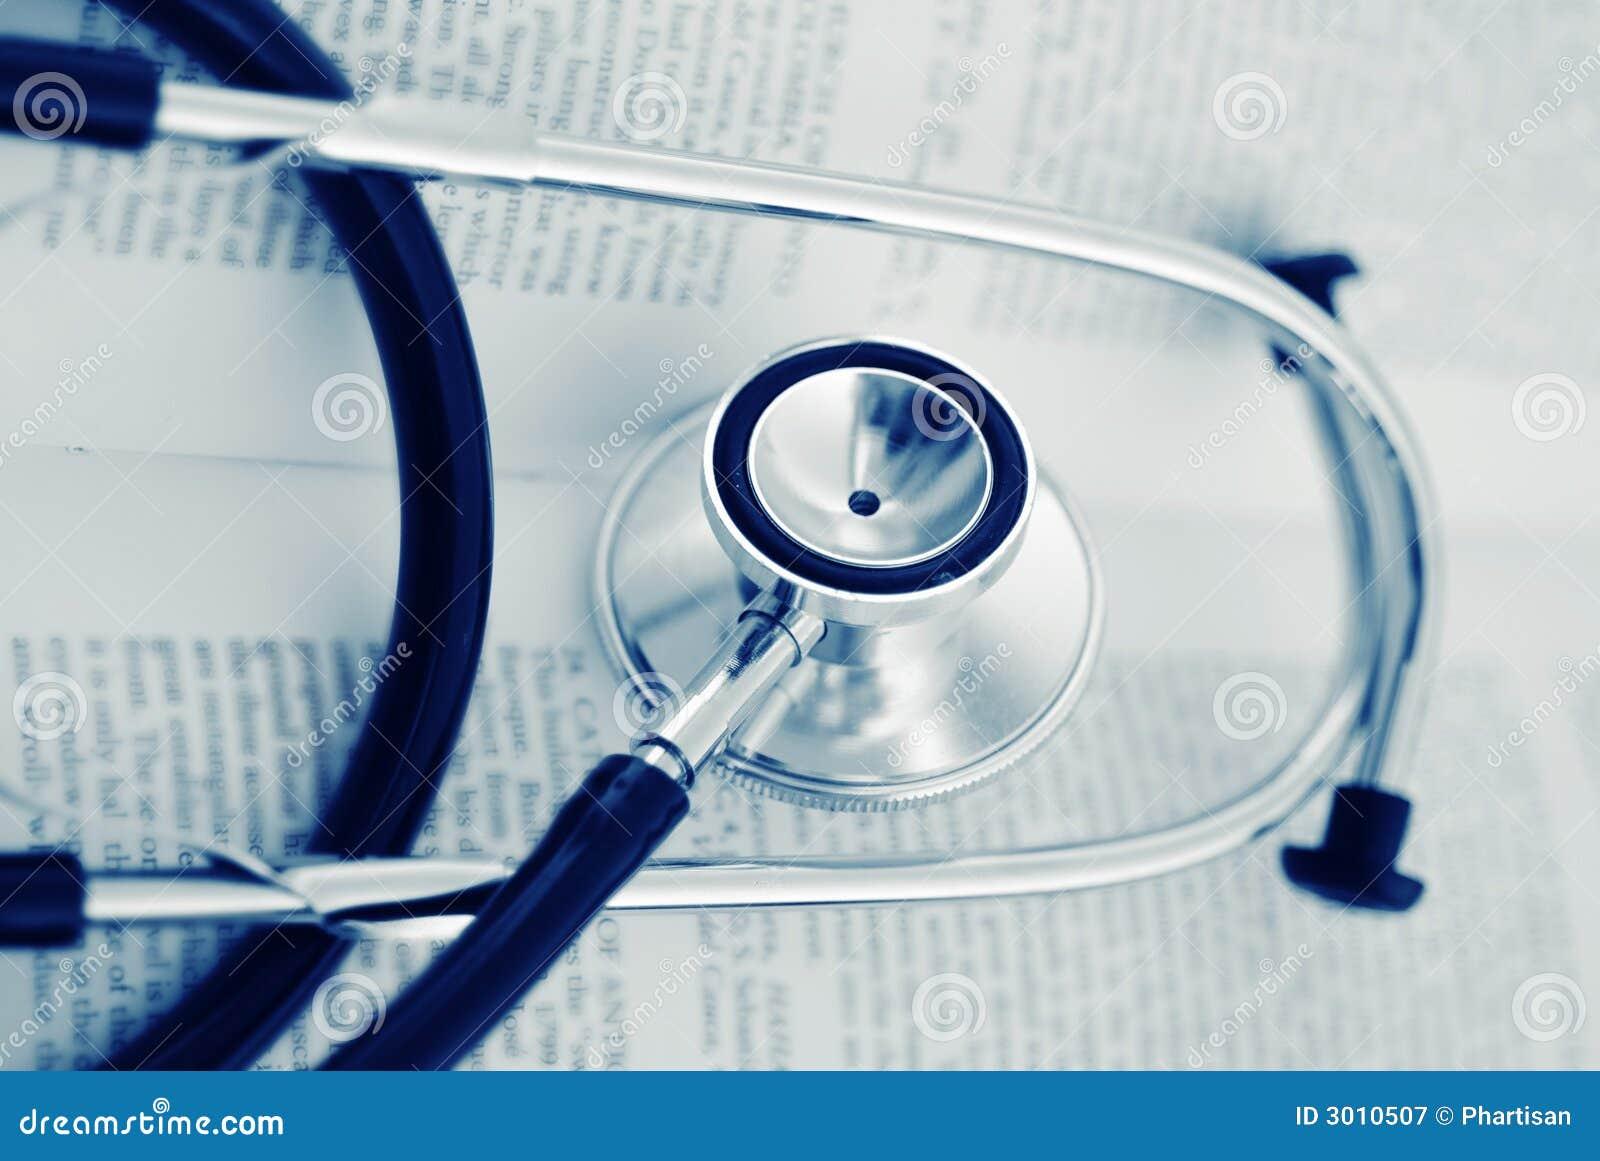 Un outil médical - stéthoscope